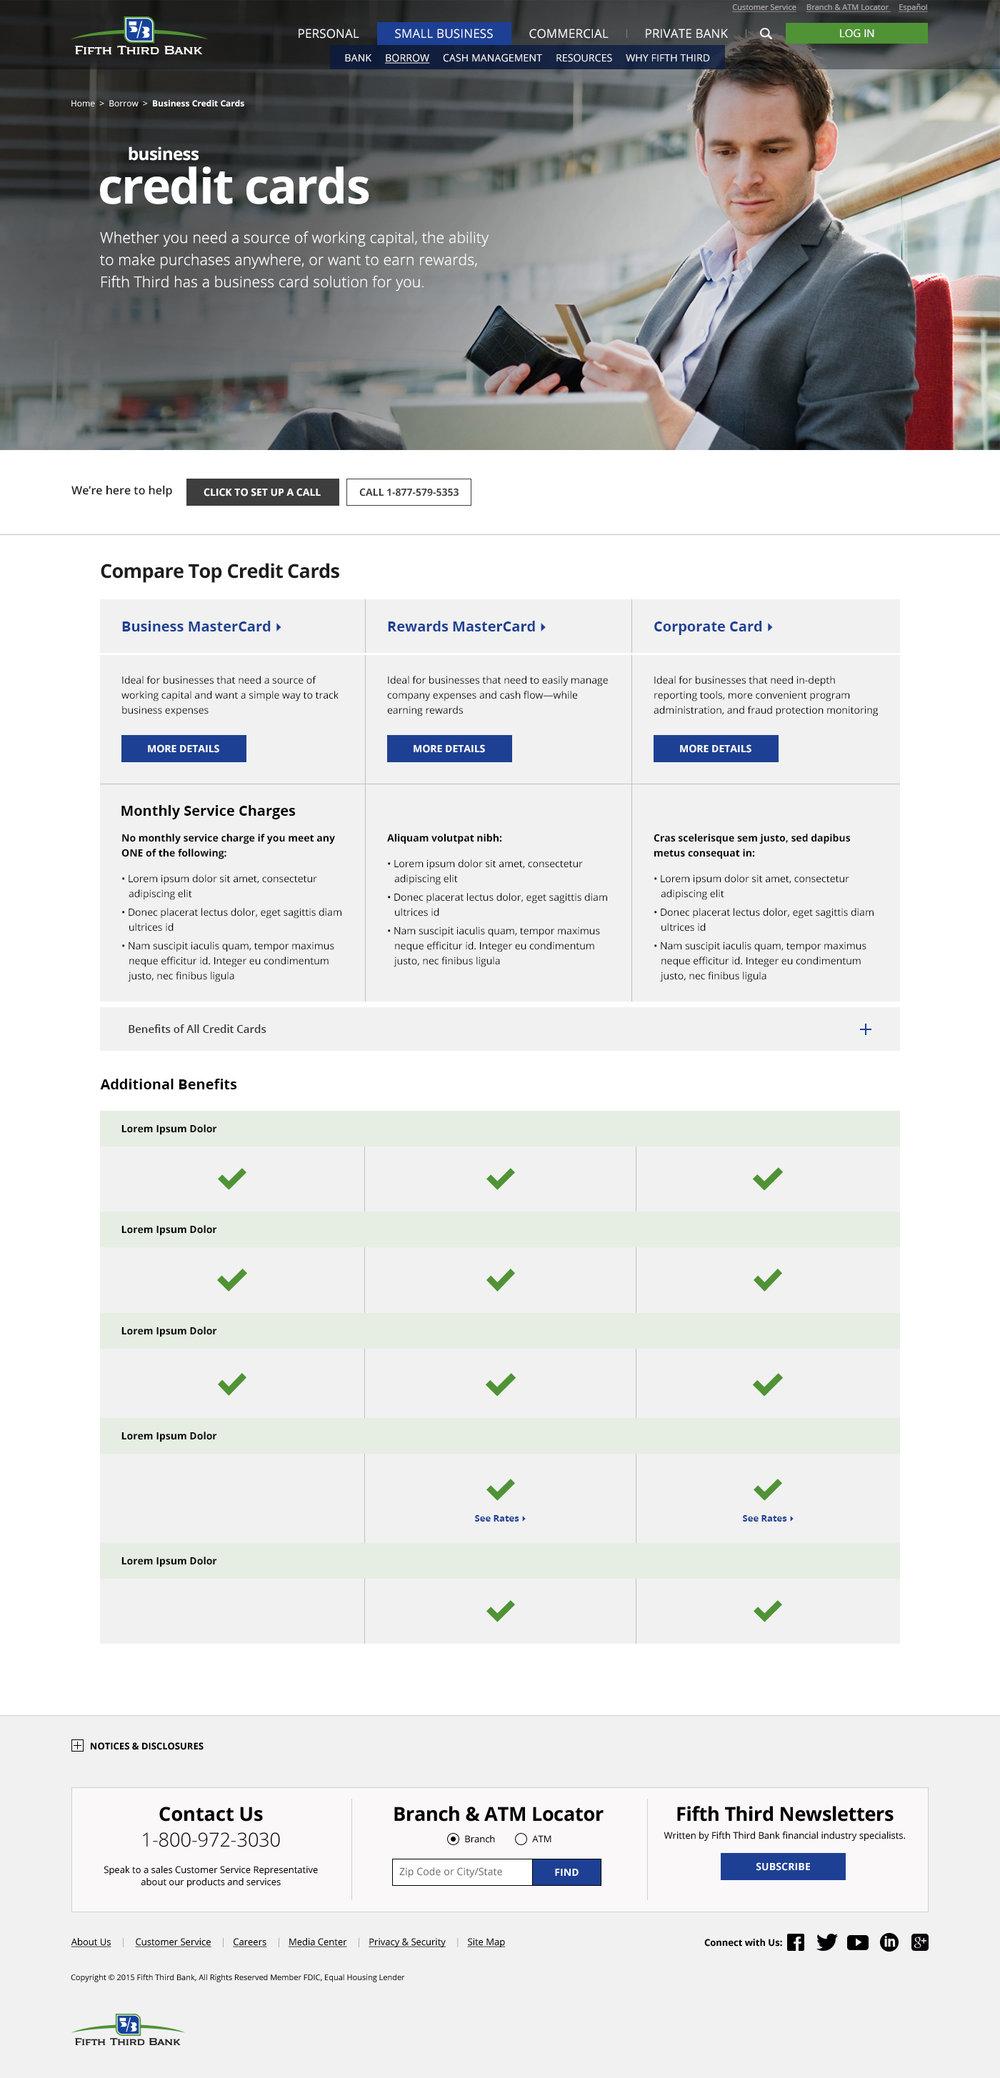 53_Set2_Desktop_3B_Business_Borrow_CreditCardLanding.jpg